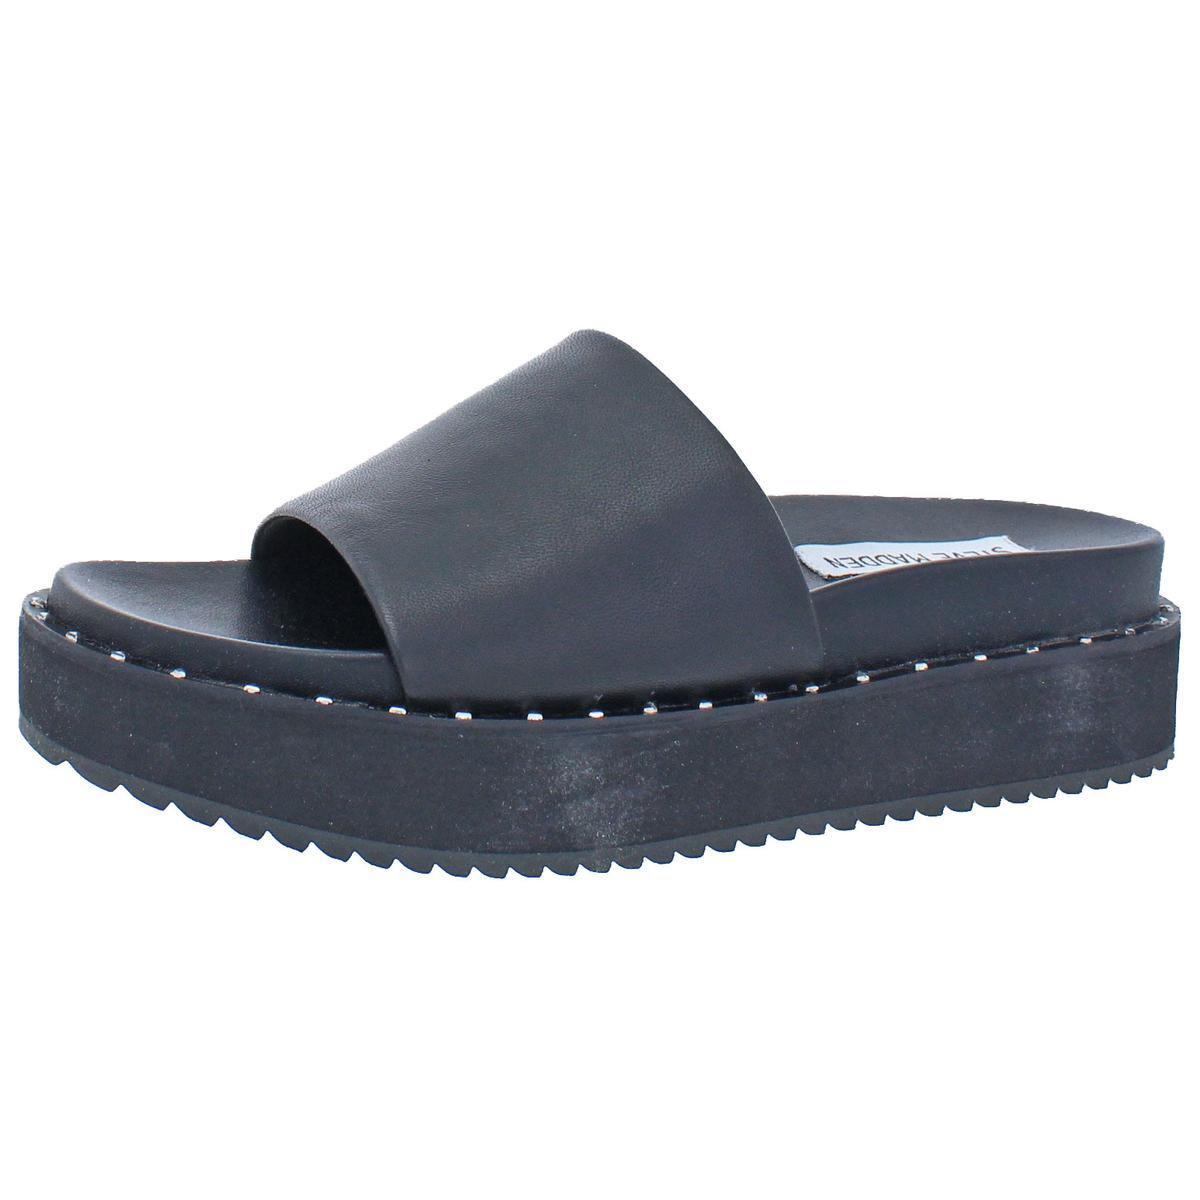 cbe9d1ecc2d Lyst - Steve Madden Womens Jen Open Toe Casual Platform Sandals in Black